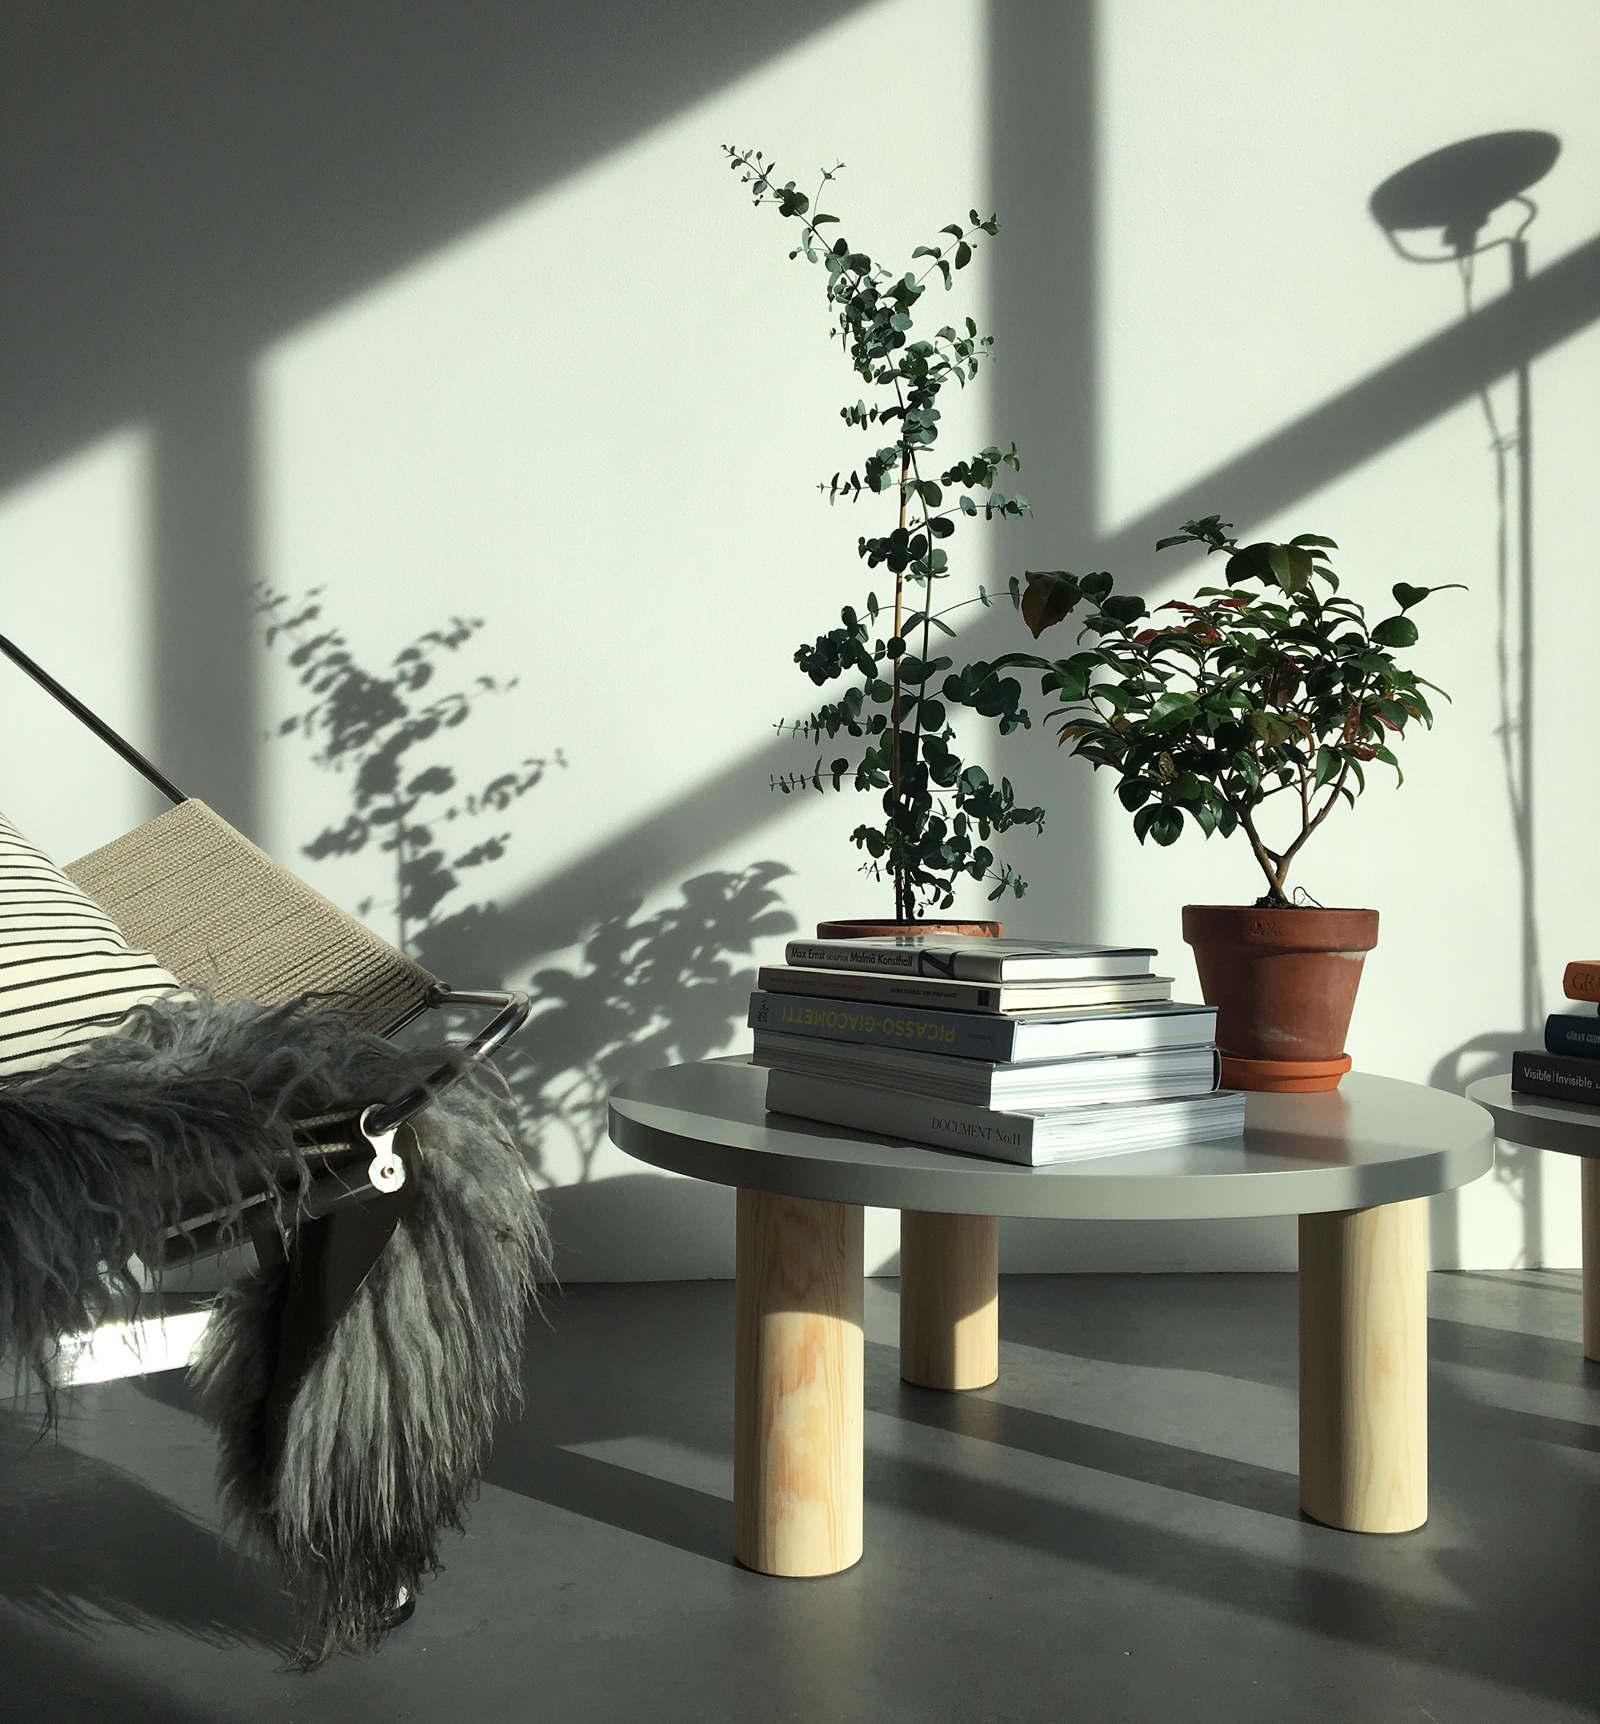 Tremendous B 12 Coffee Table Lacquer Bordbord Machost Co Dining Chair Design Ideas Machostcouk